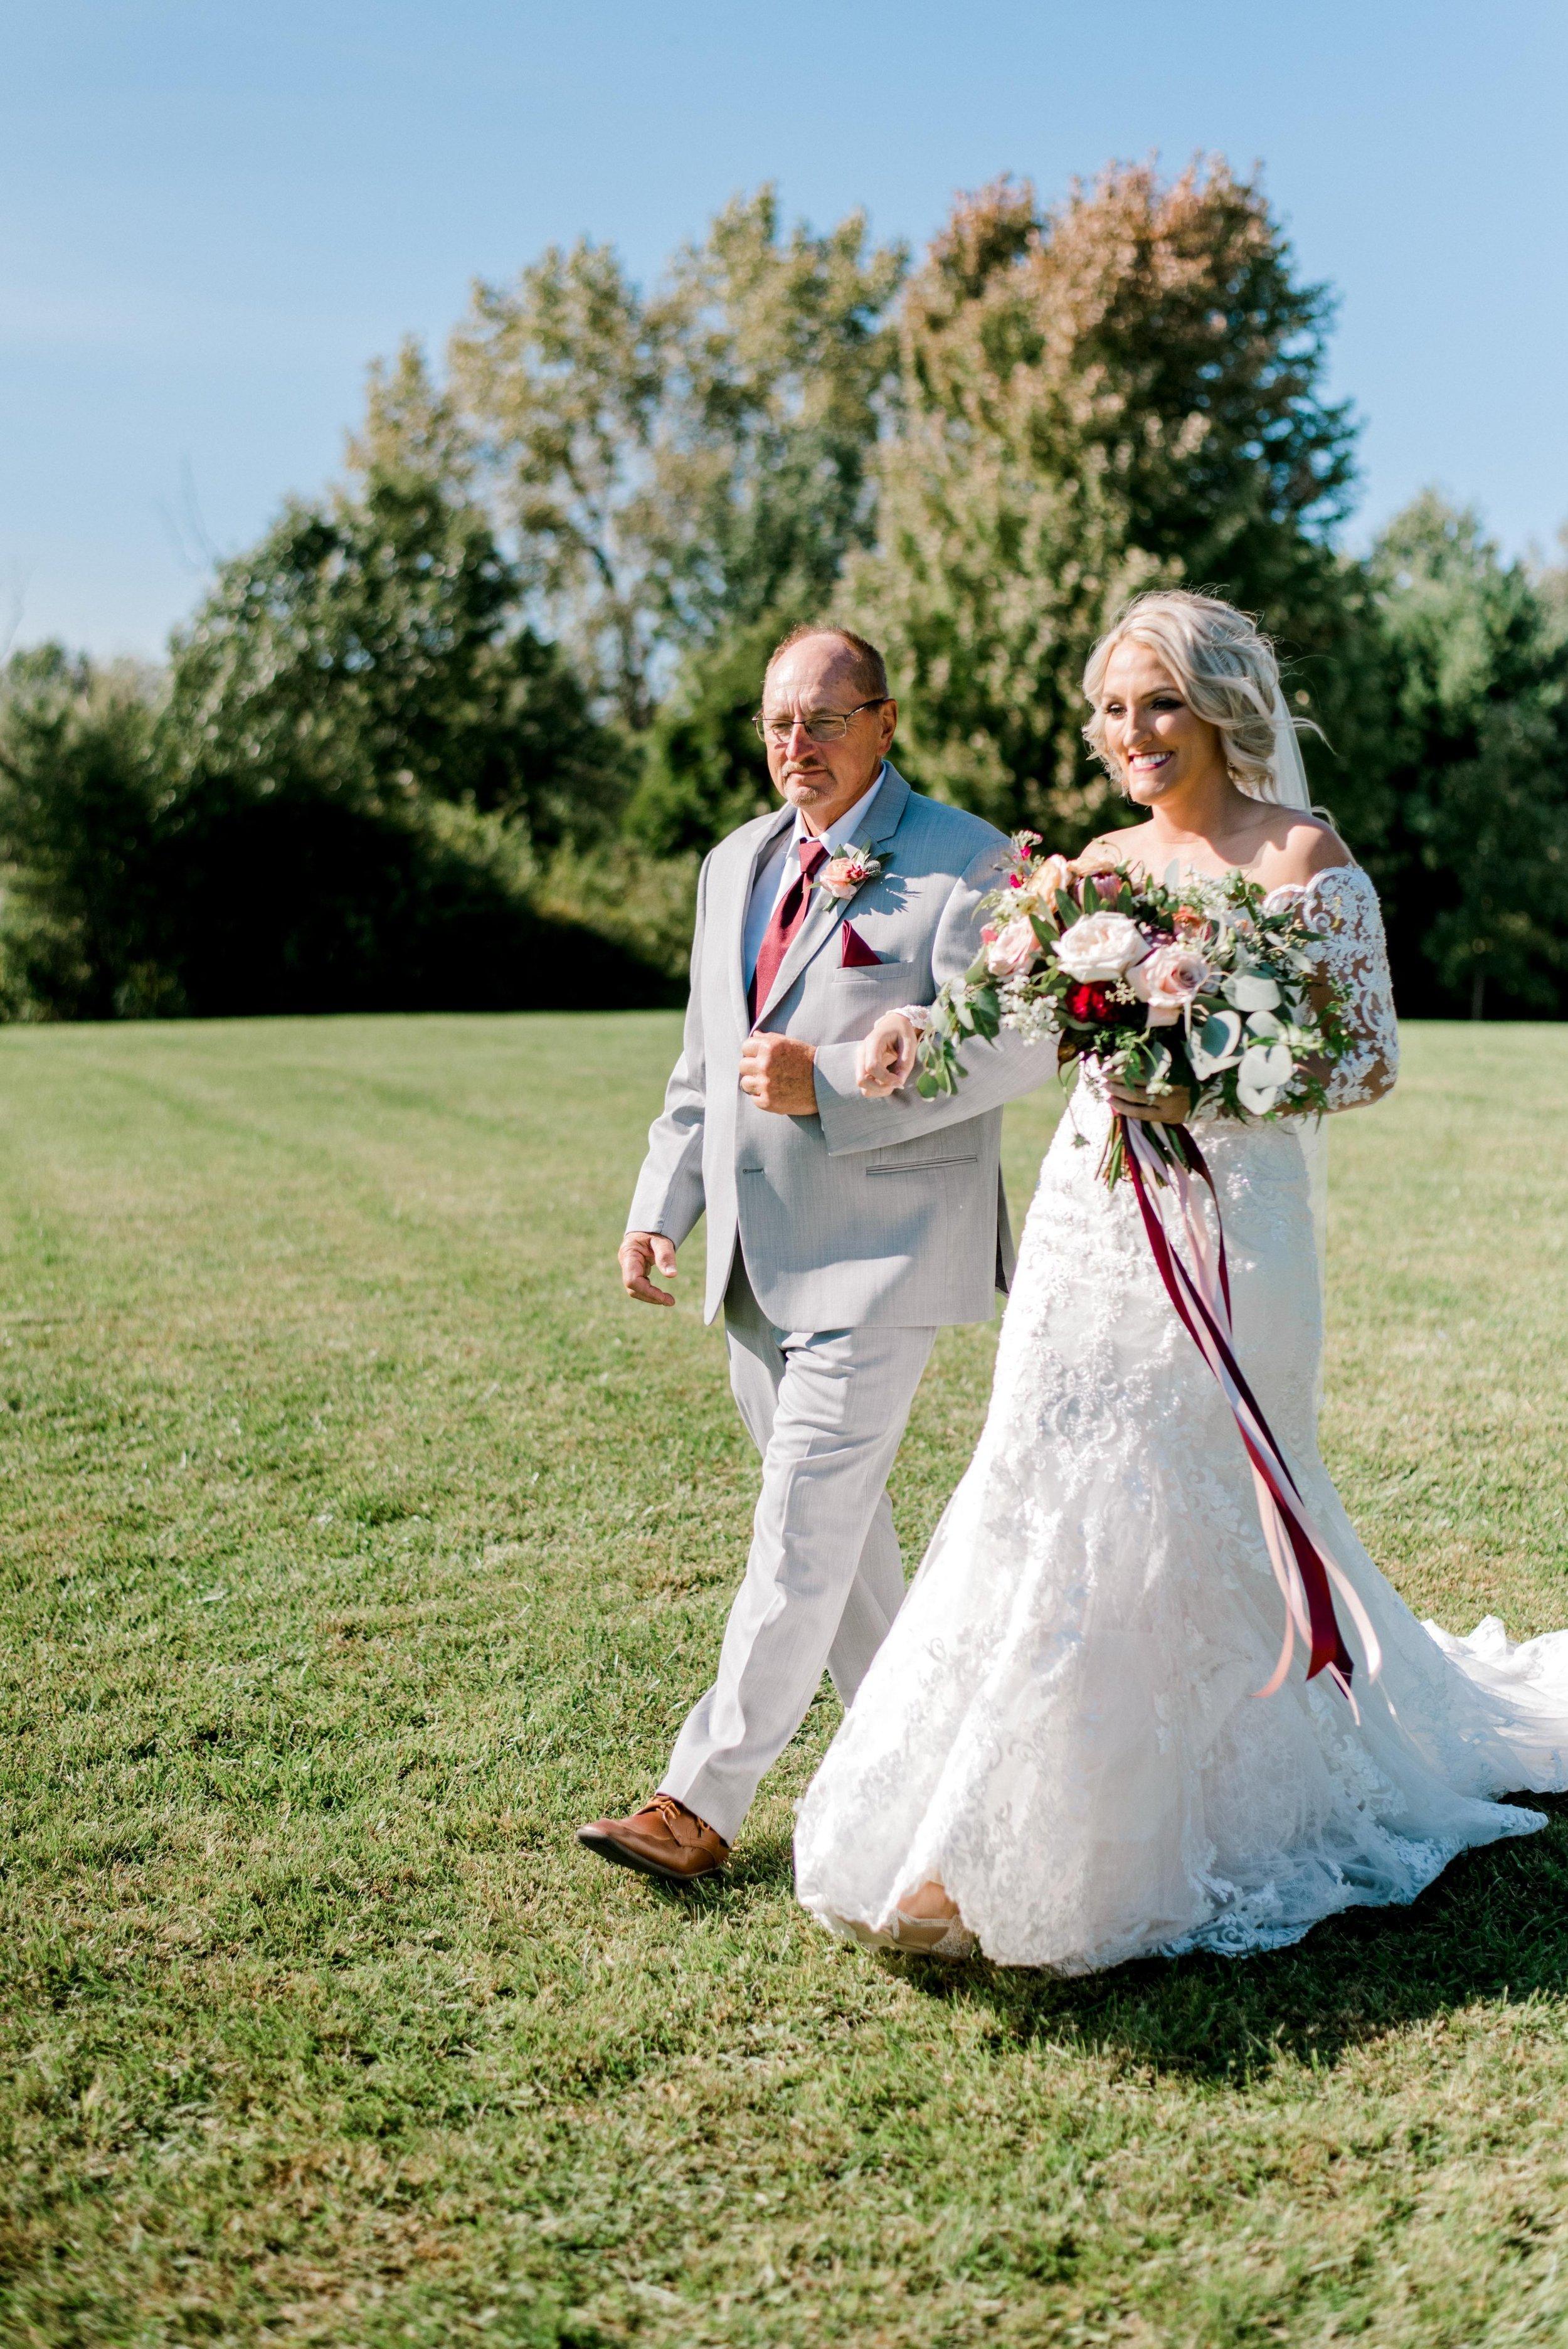 Ryan Alexa Married-Formals Ceremony-0133.jpg